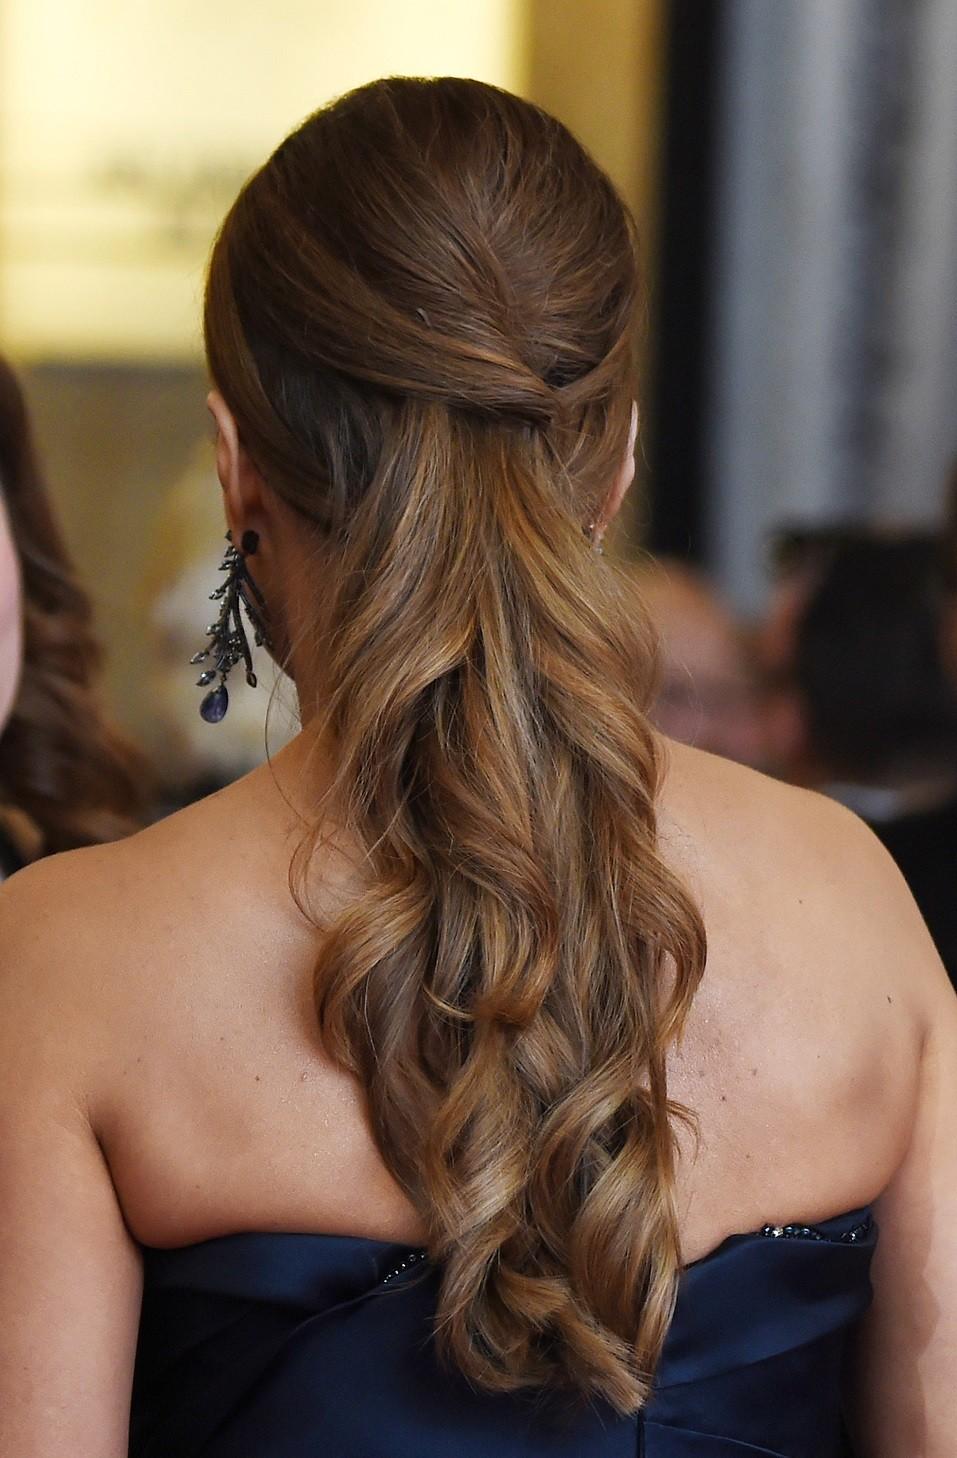 Actress Sofia Vergara attends the 88th Annual Academy Awards